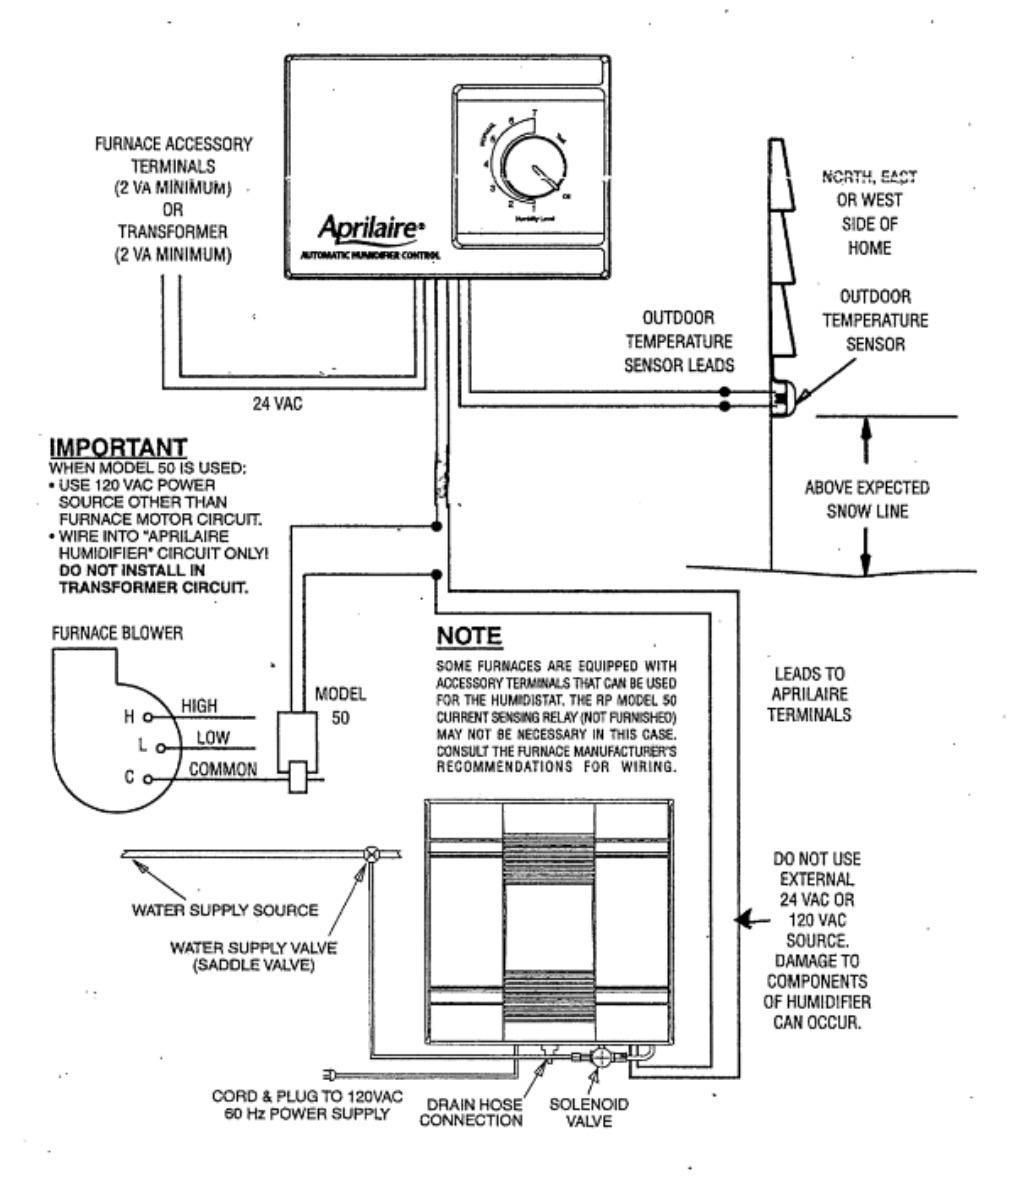 hight resolution of trane xv95 thermostat wiring diagram trane xv95 thermostat wiring diagram trane weathertron thermostat wiringm xv95